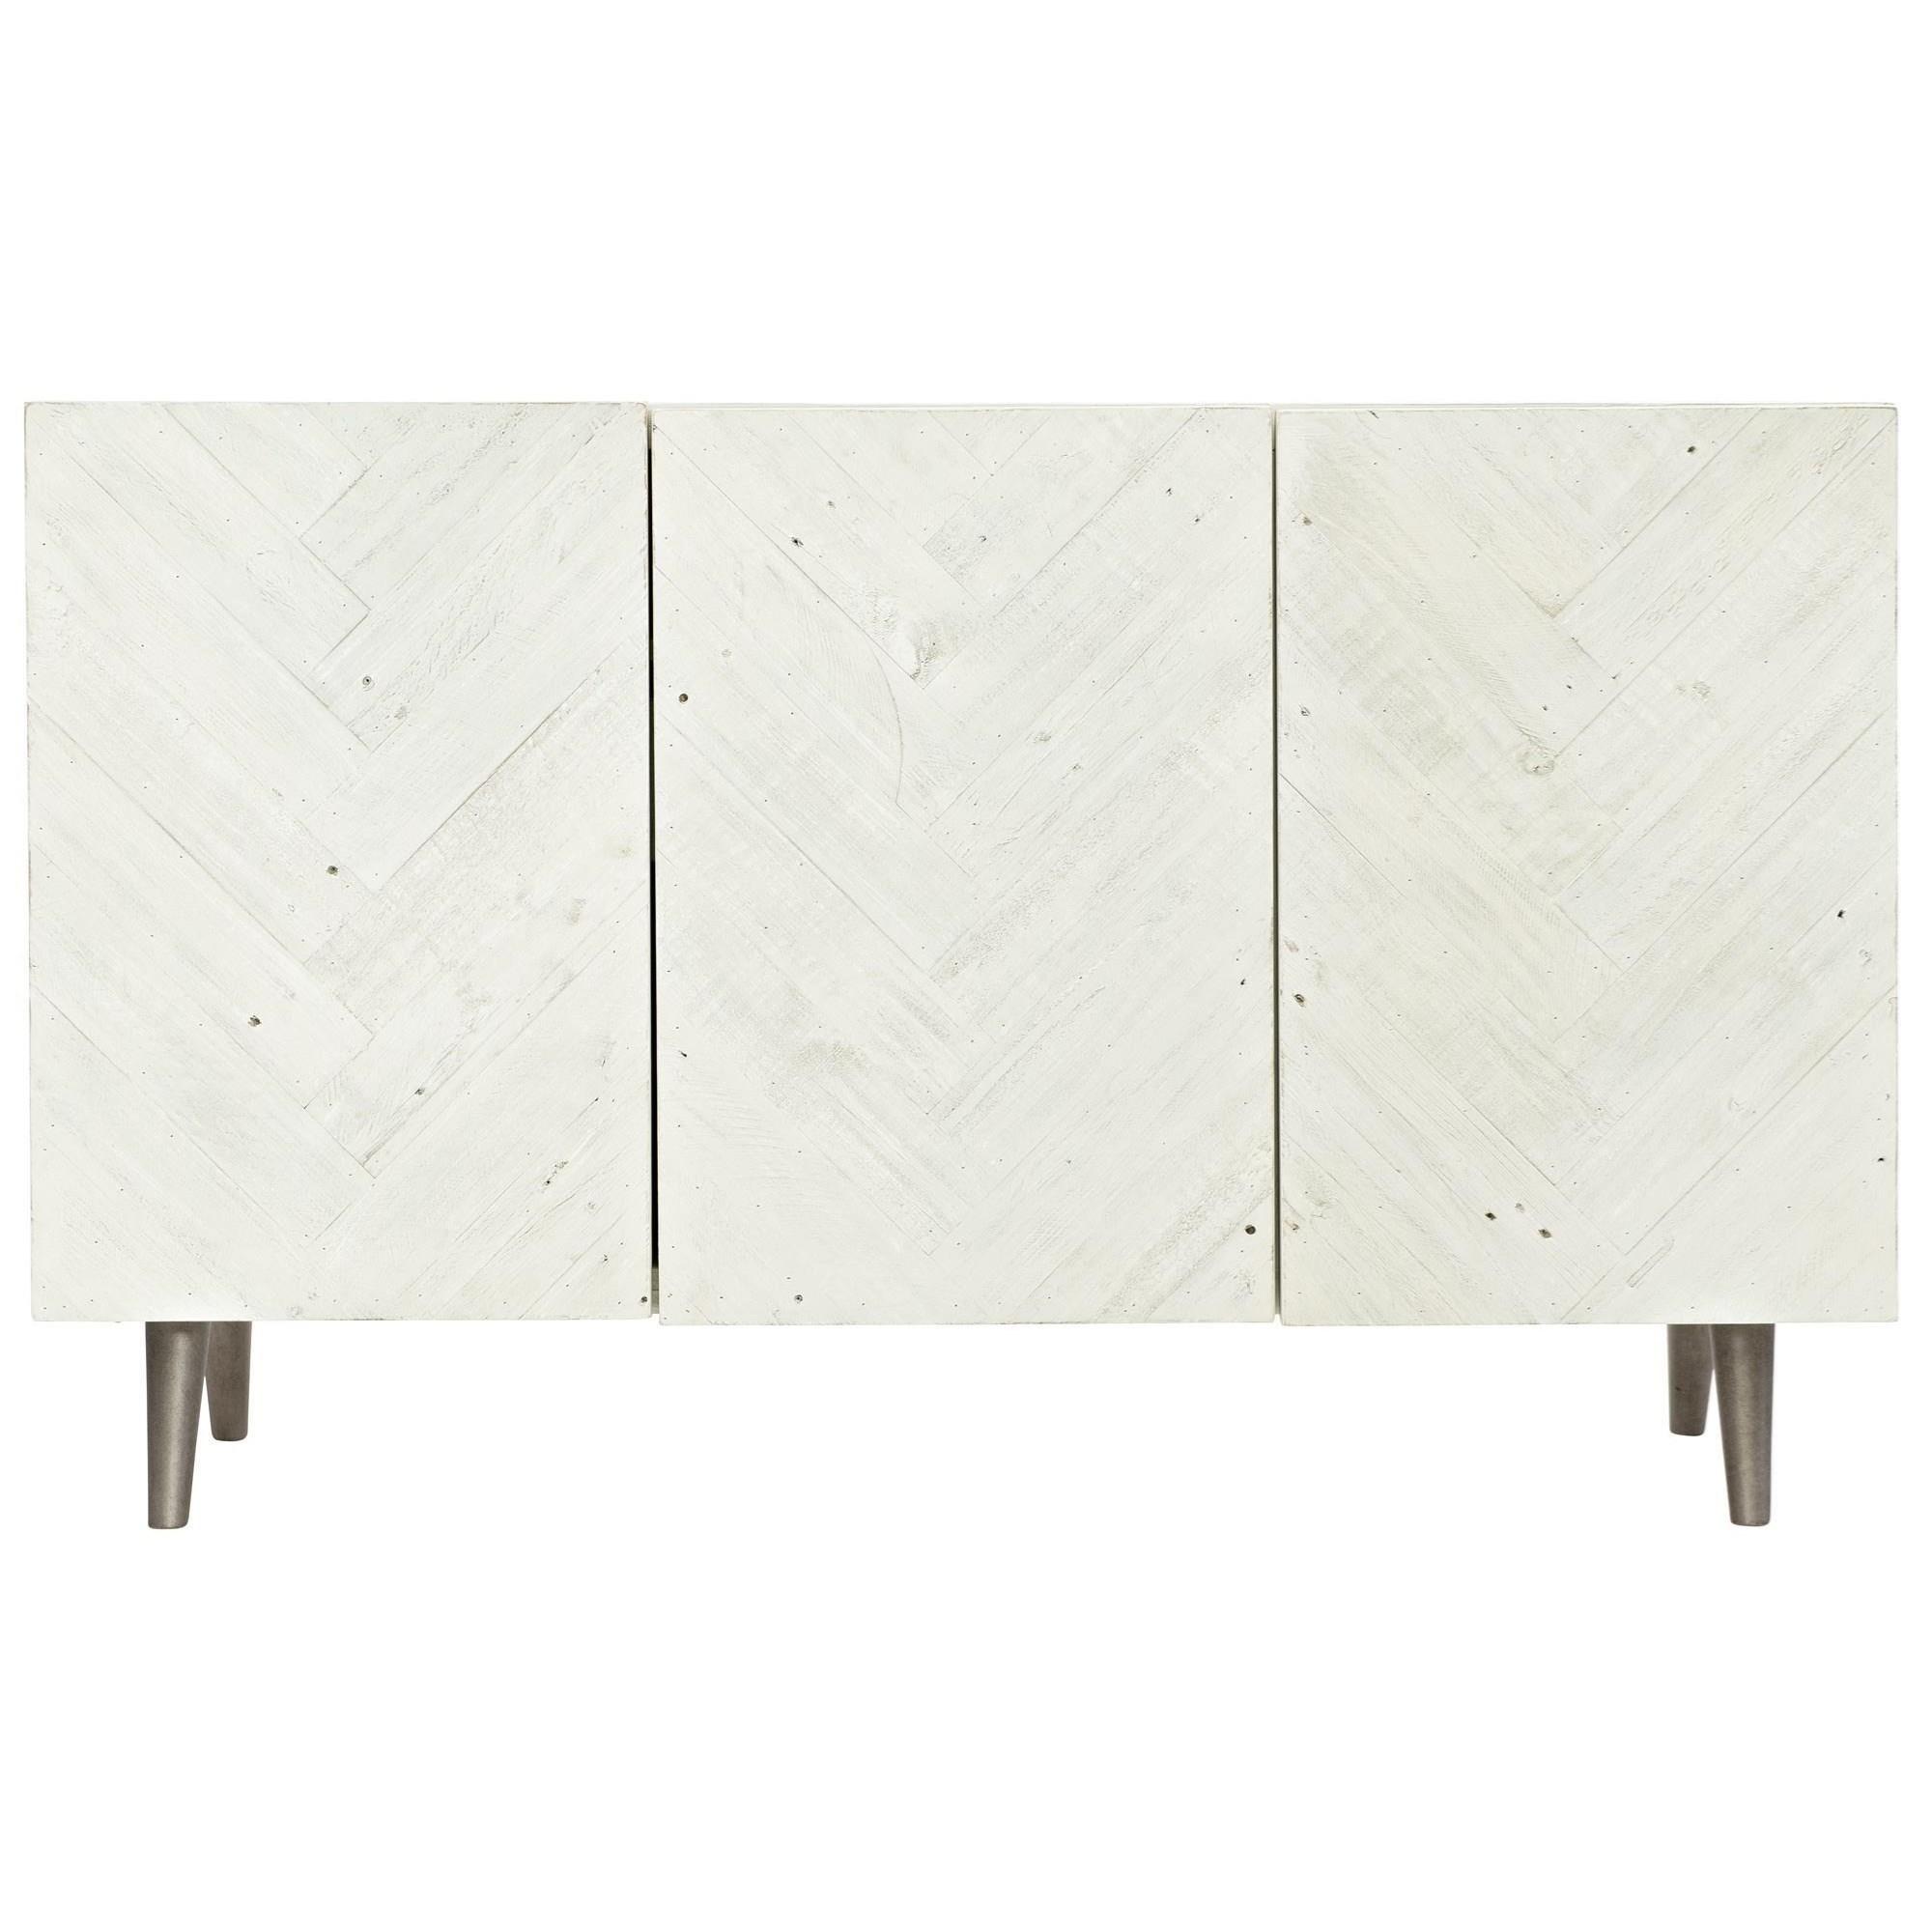 Loft - Highland Park Macauley Sideboard by Bernhardt at Baer's Furniture